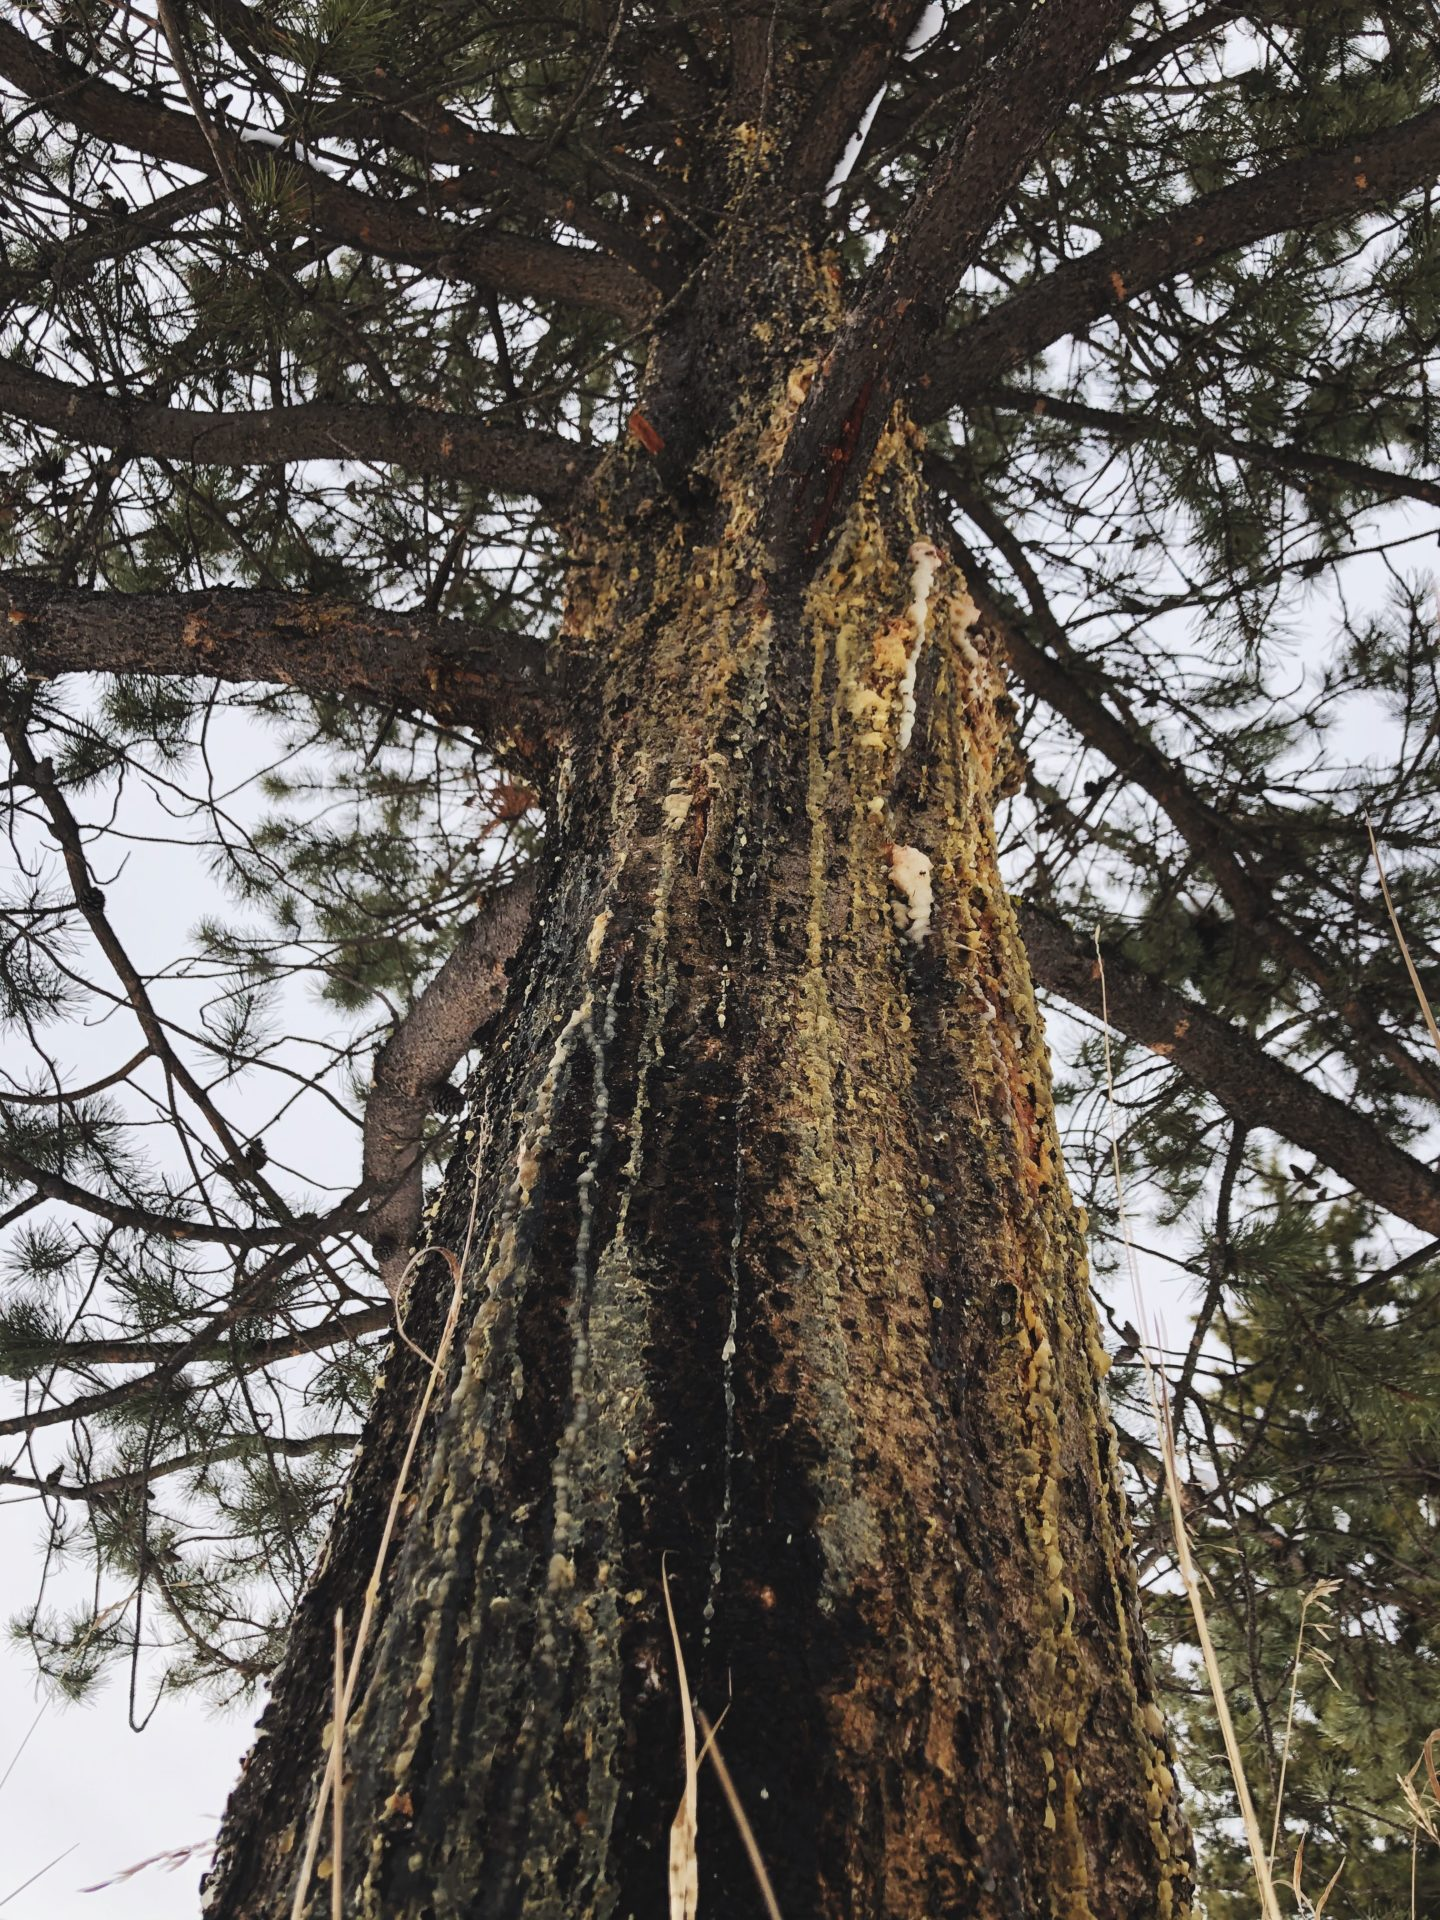 Lodgepole Pine. Credit: Raeanne O'Meara.